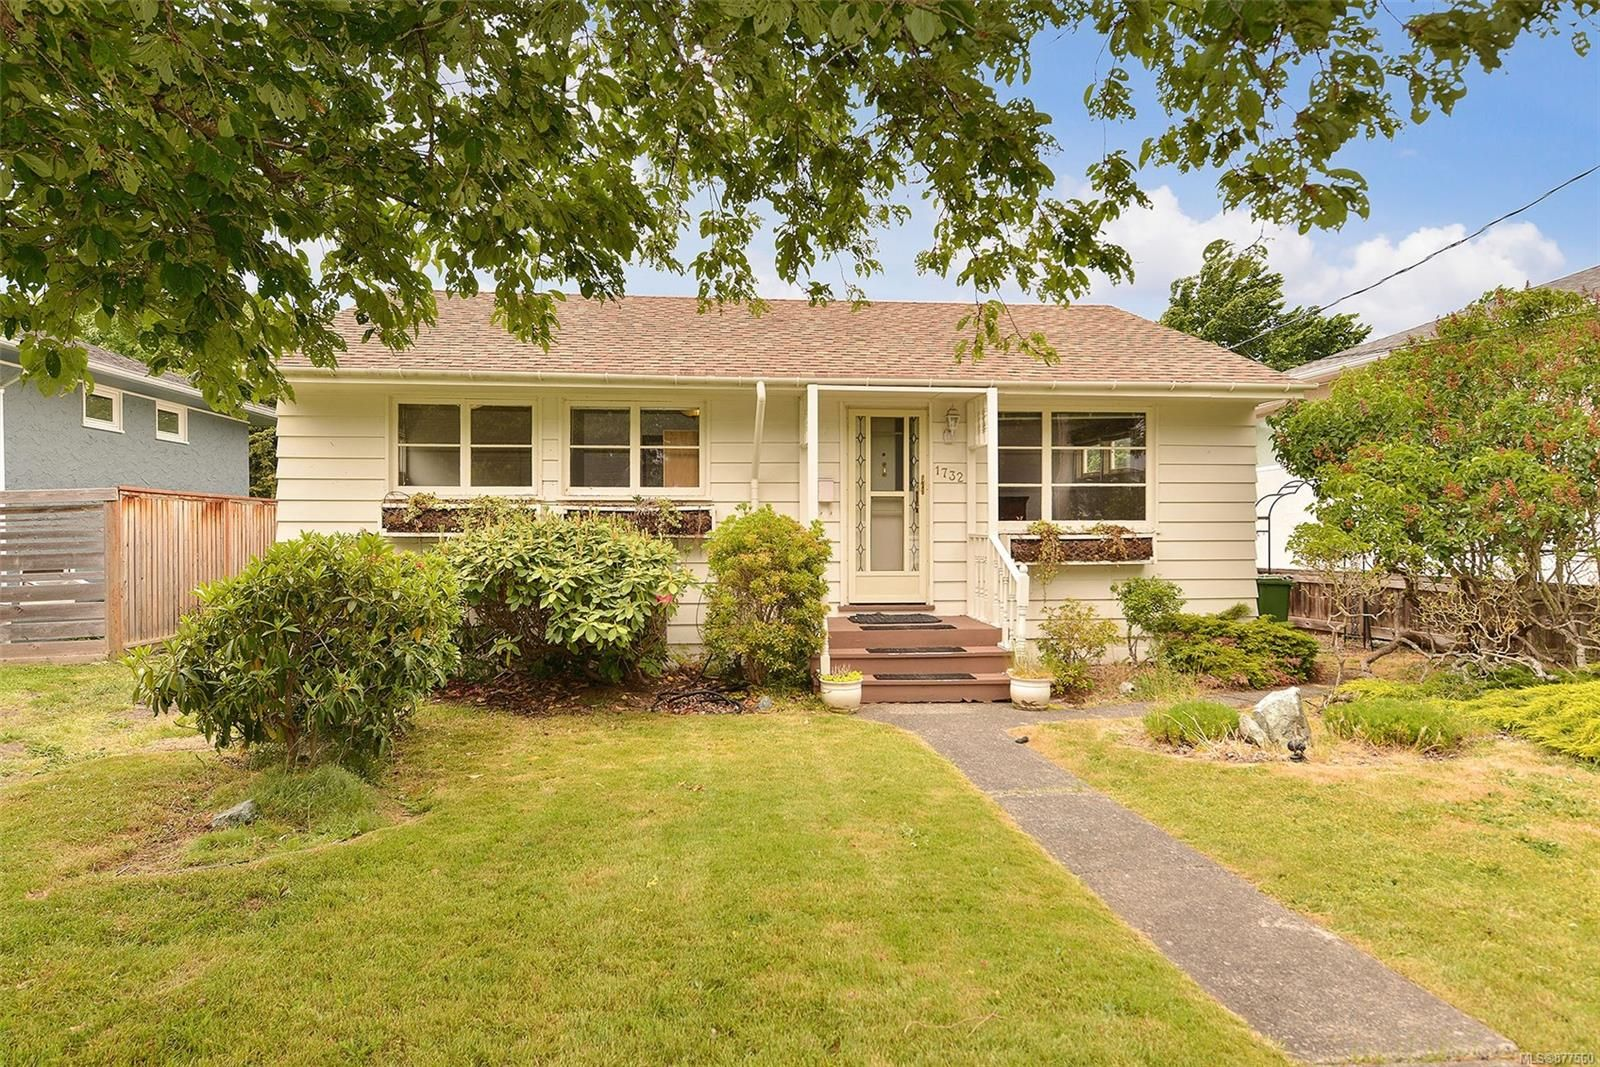 Main Photo: 1732 AMPHION St in : Vi Jubilee House for sale (Victoria)  : MLS®# 877560